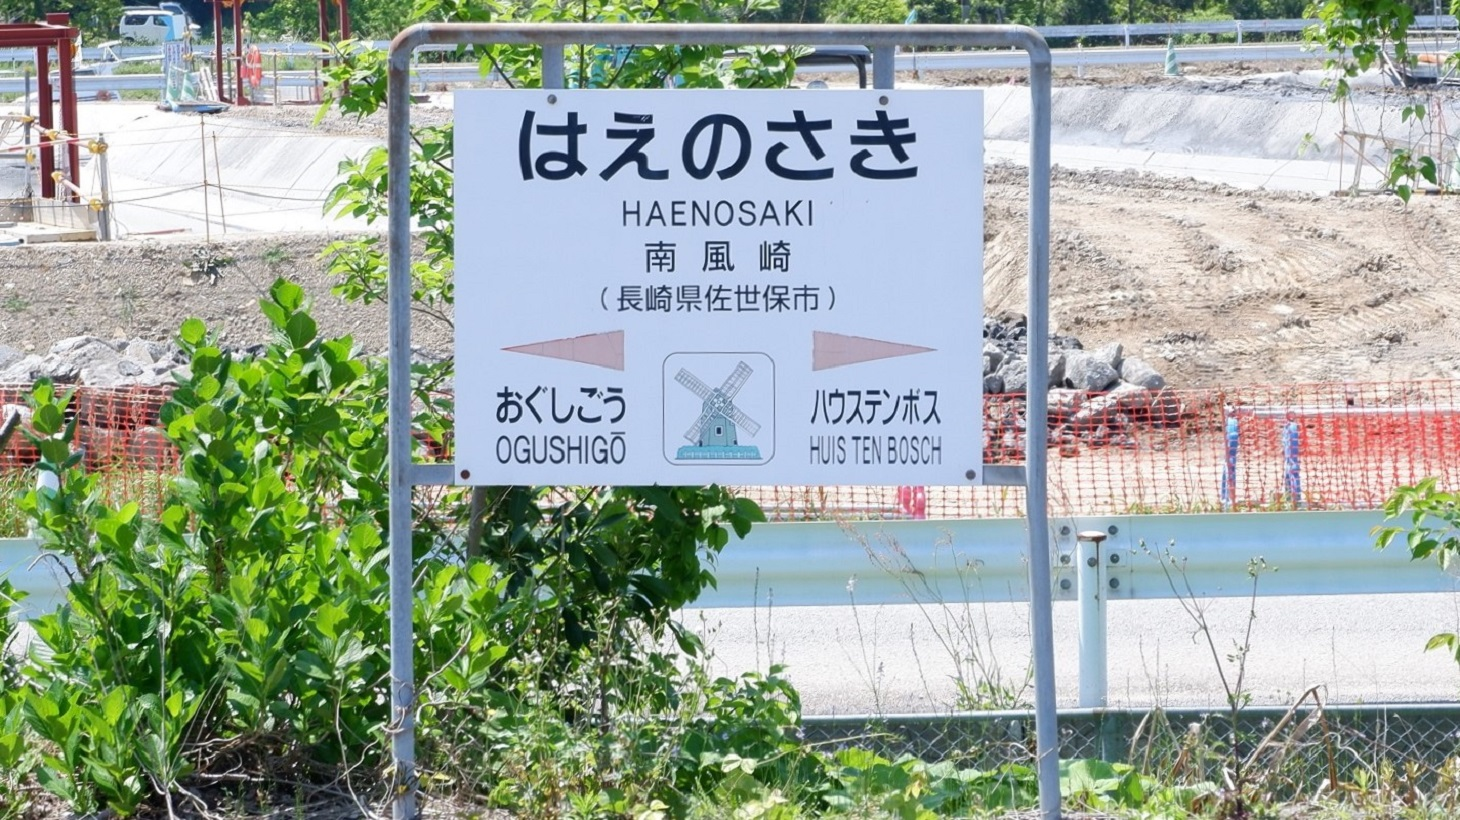 南風崎駅 駅名標